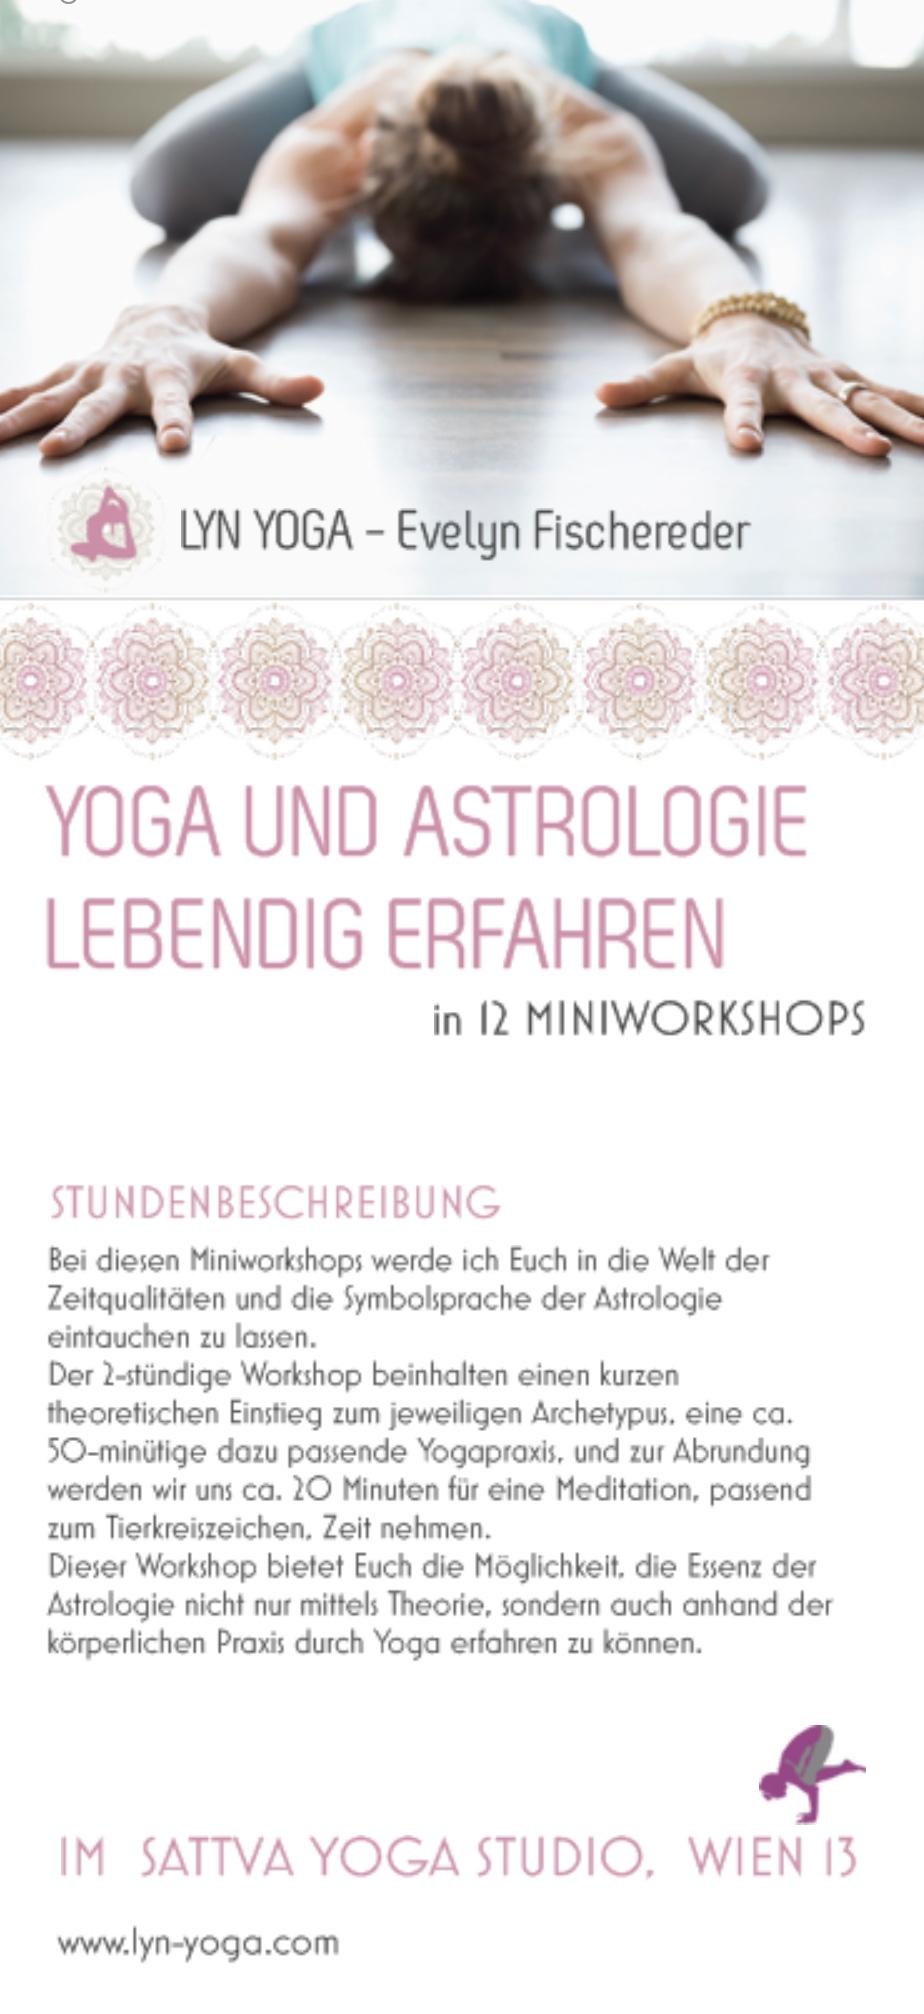 Yoga und Astrologie Workshop im Sattva Yoga Studio Wien von Lyn Yoga